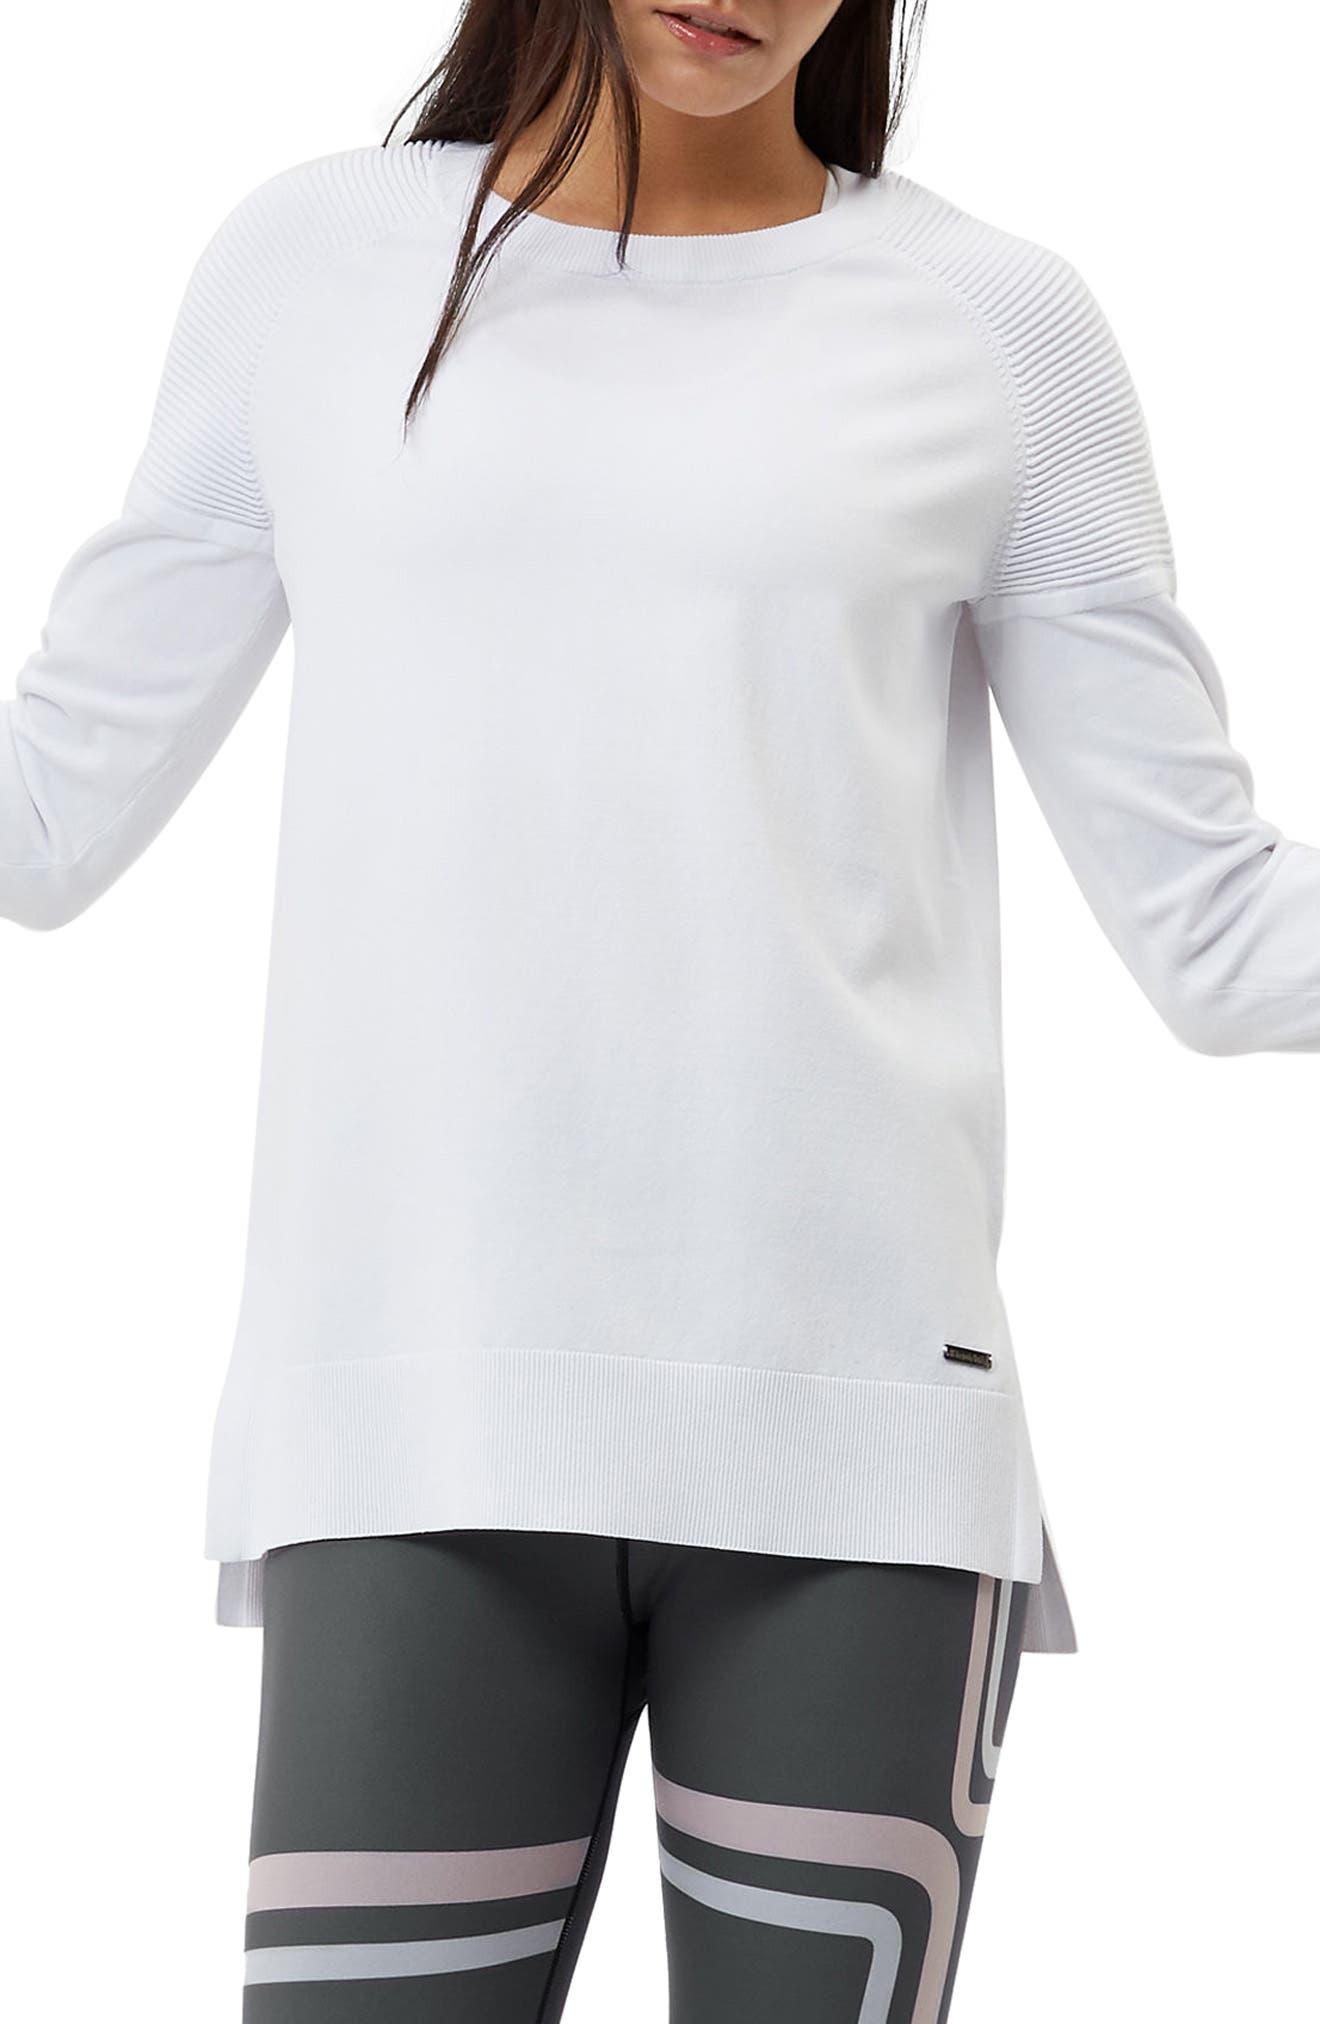 8 Track Sweatshirt,                         Main,                         color, 100